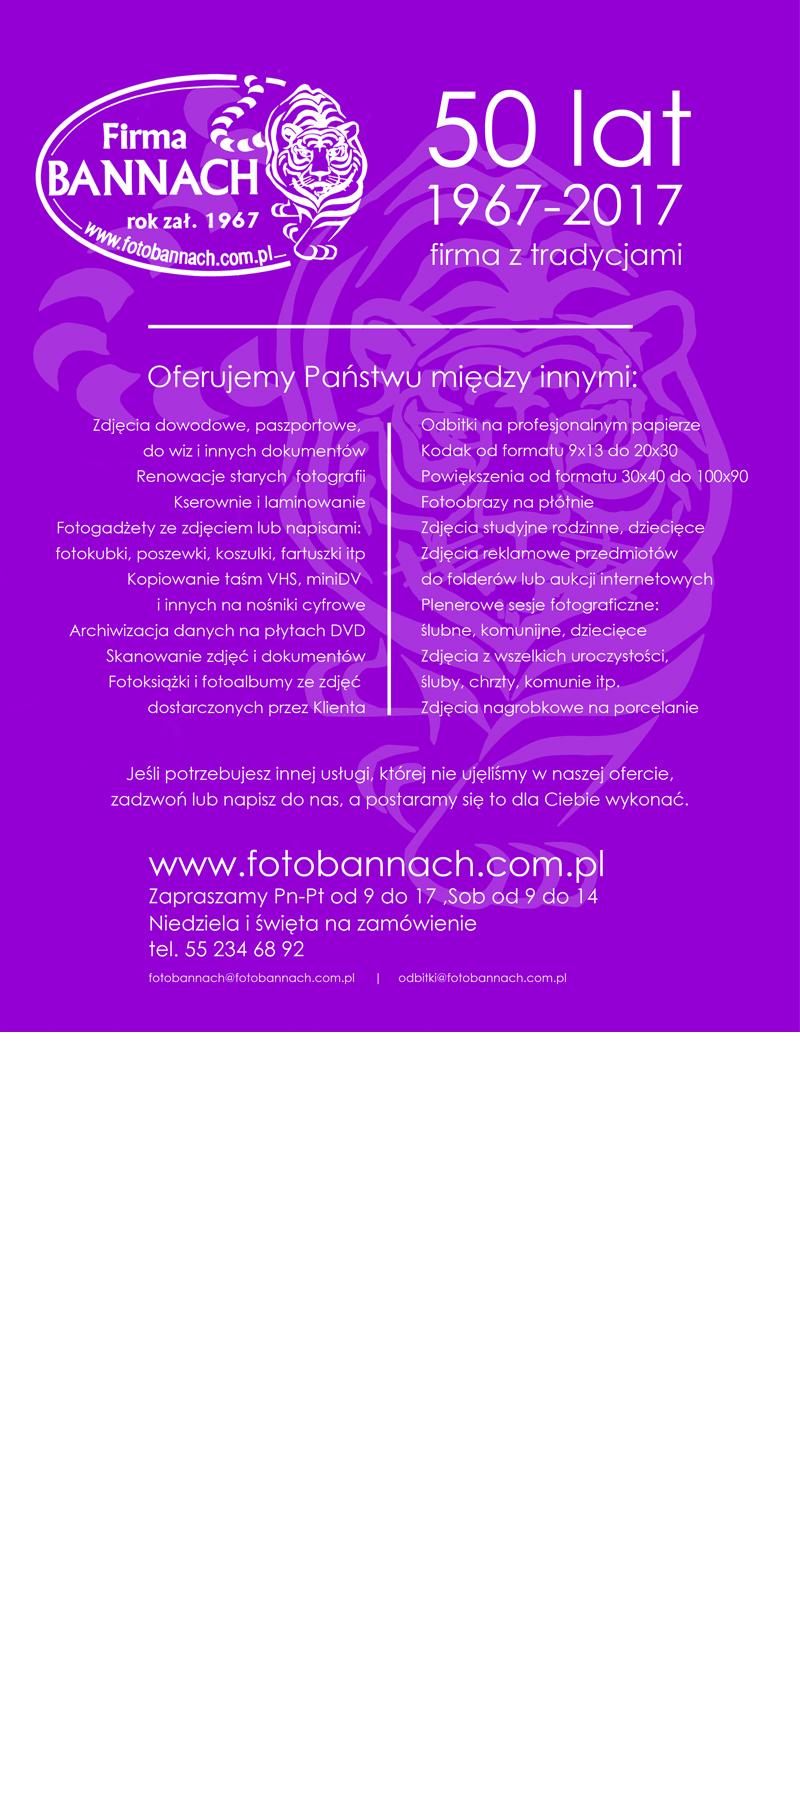 firma bannach - oferta